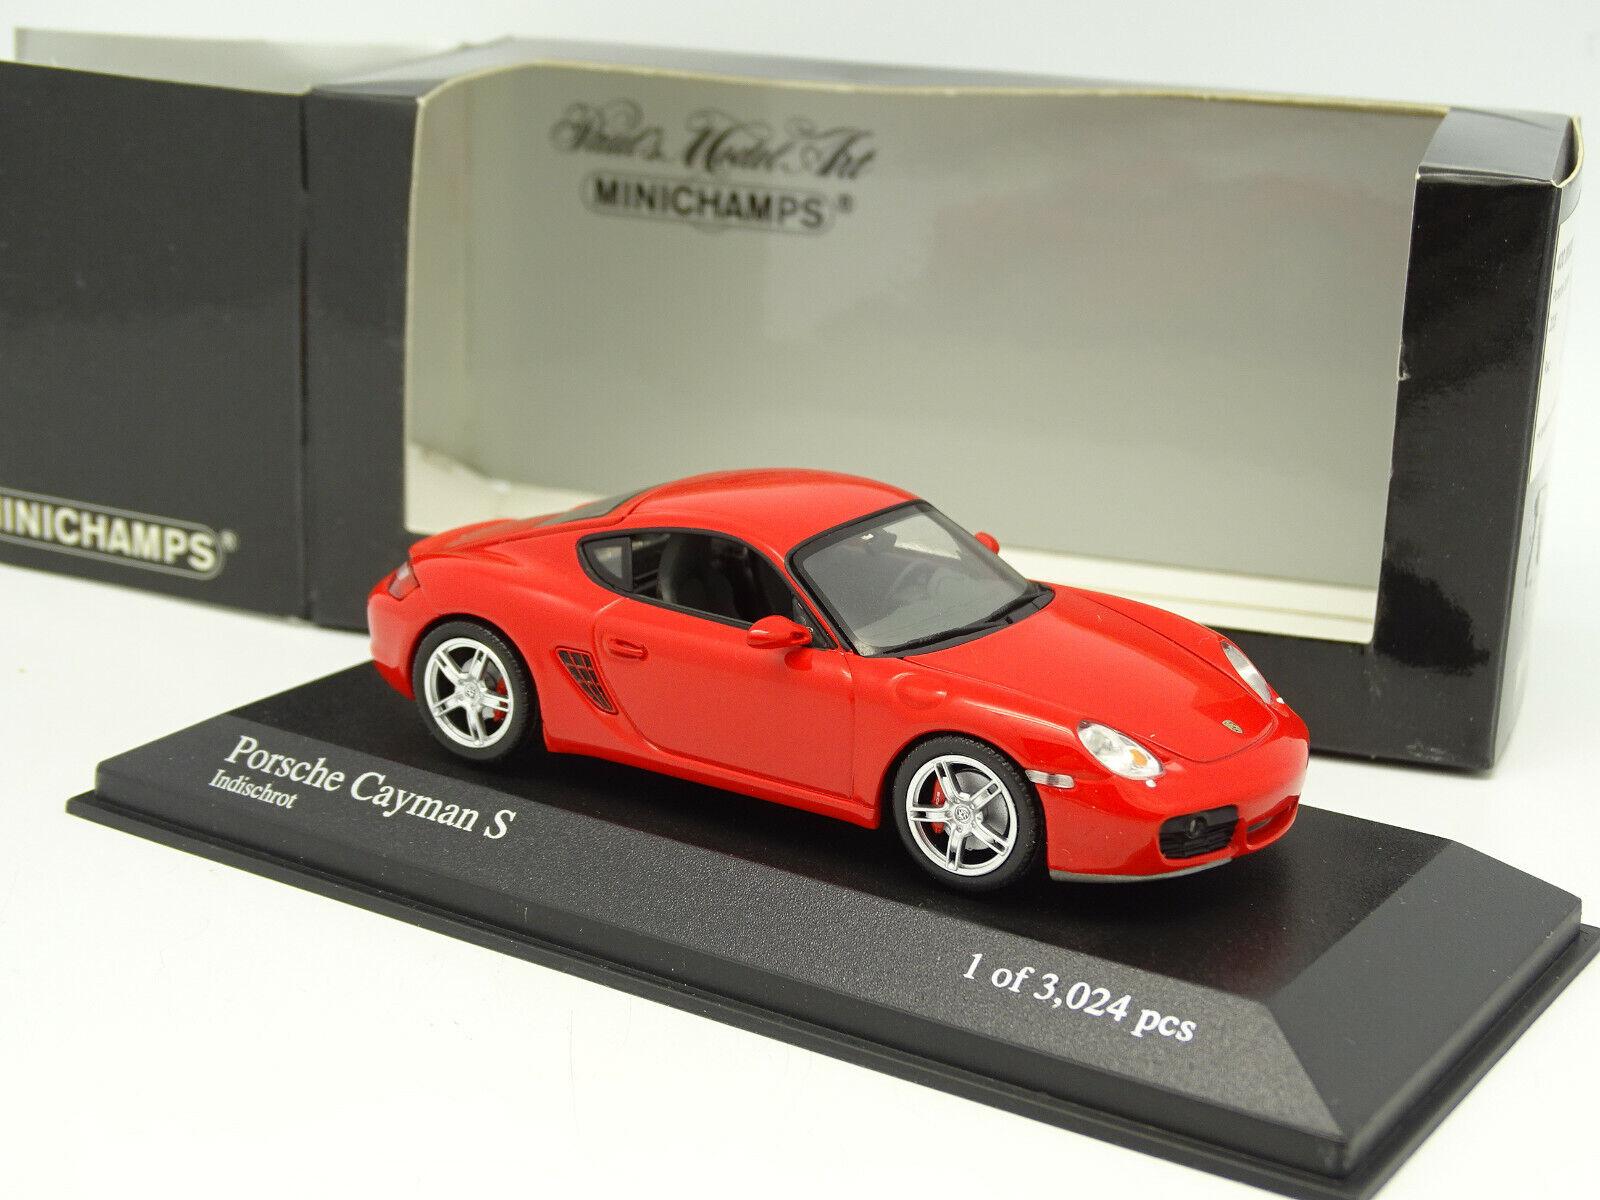 Minichamps 1 1 1 43 - Porsche Cayman S Red 3ef3af